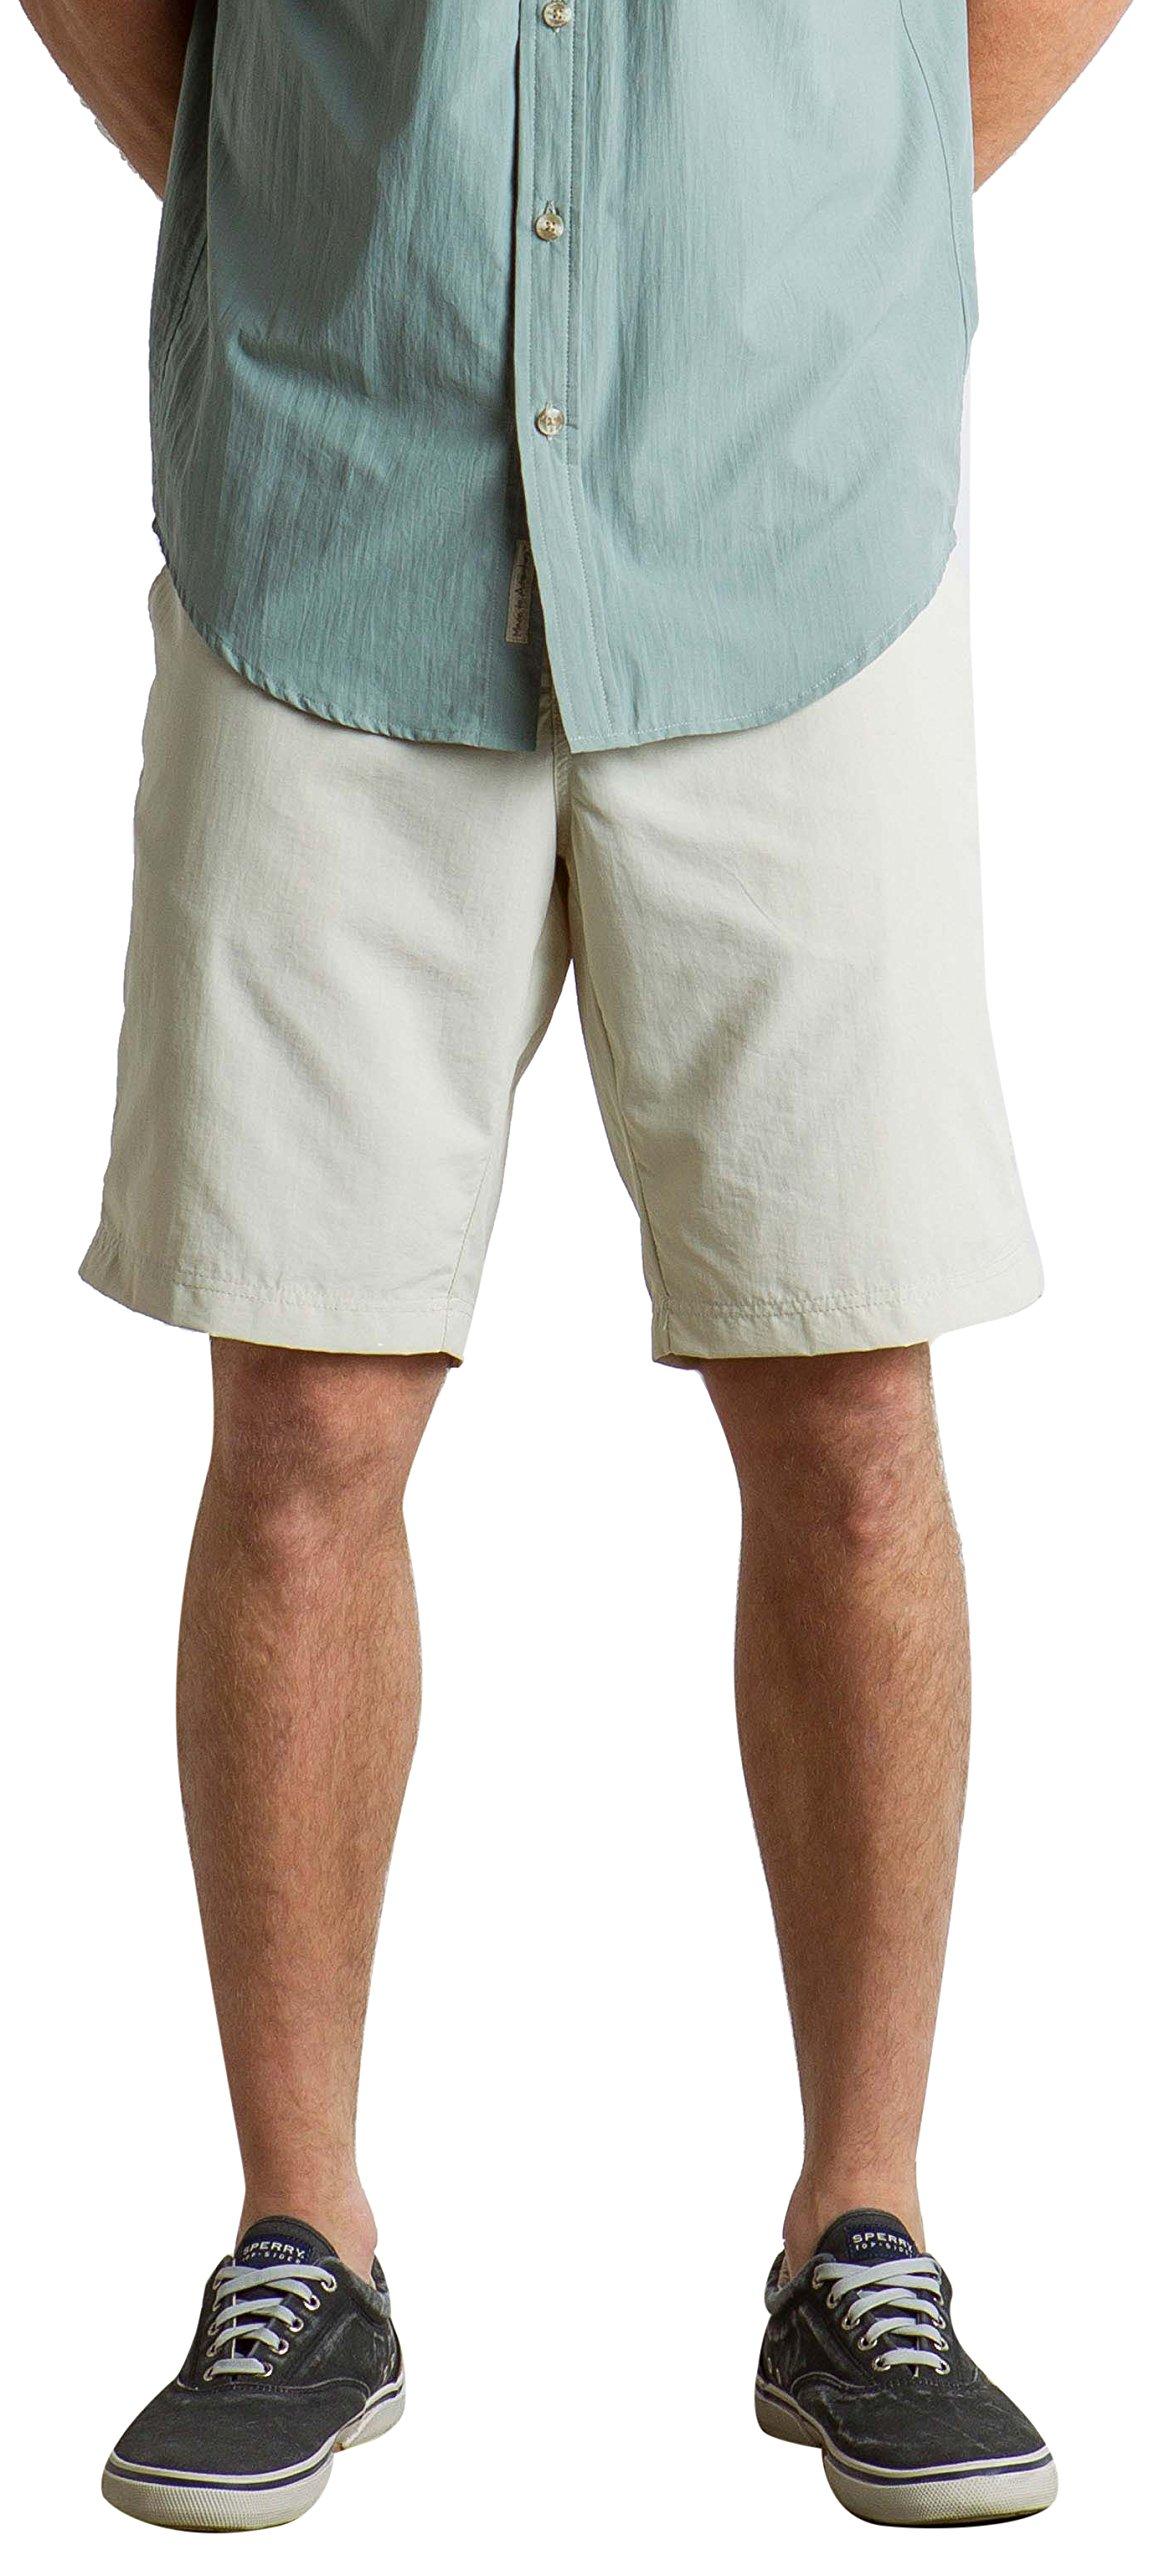 ExOfficio Men's Sol Cool Nomad Lightweight Quick-Dry Shorts, 10'', Light Stone, Size 30 by ExOfficio